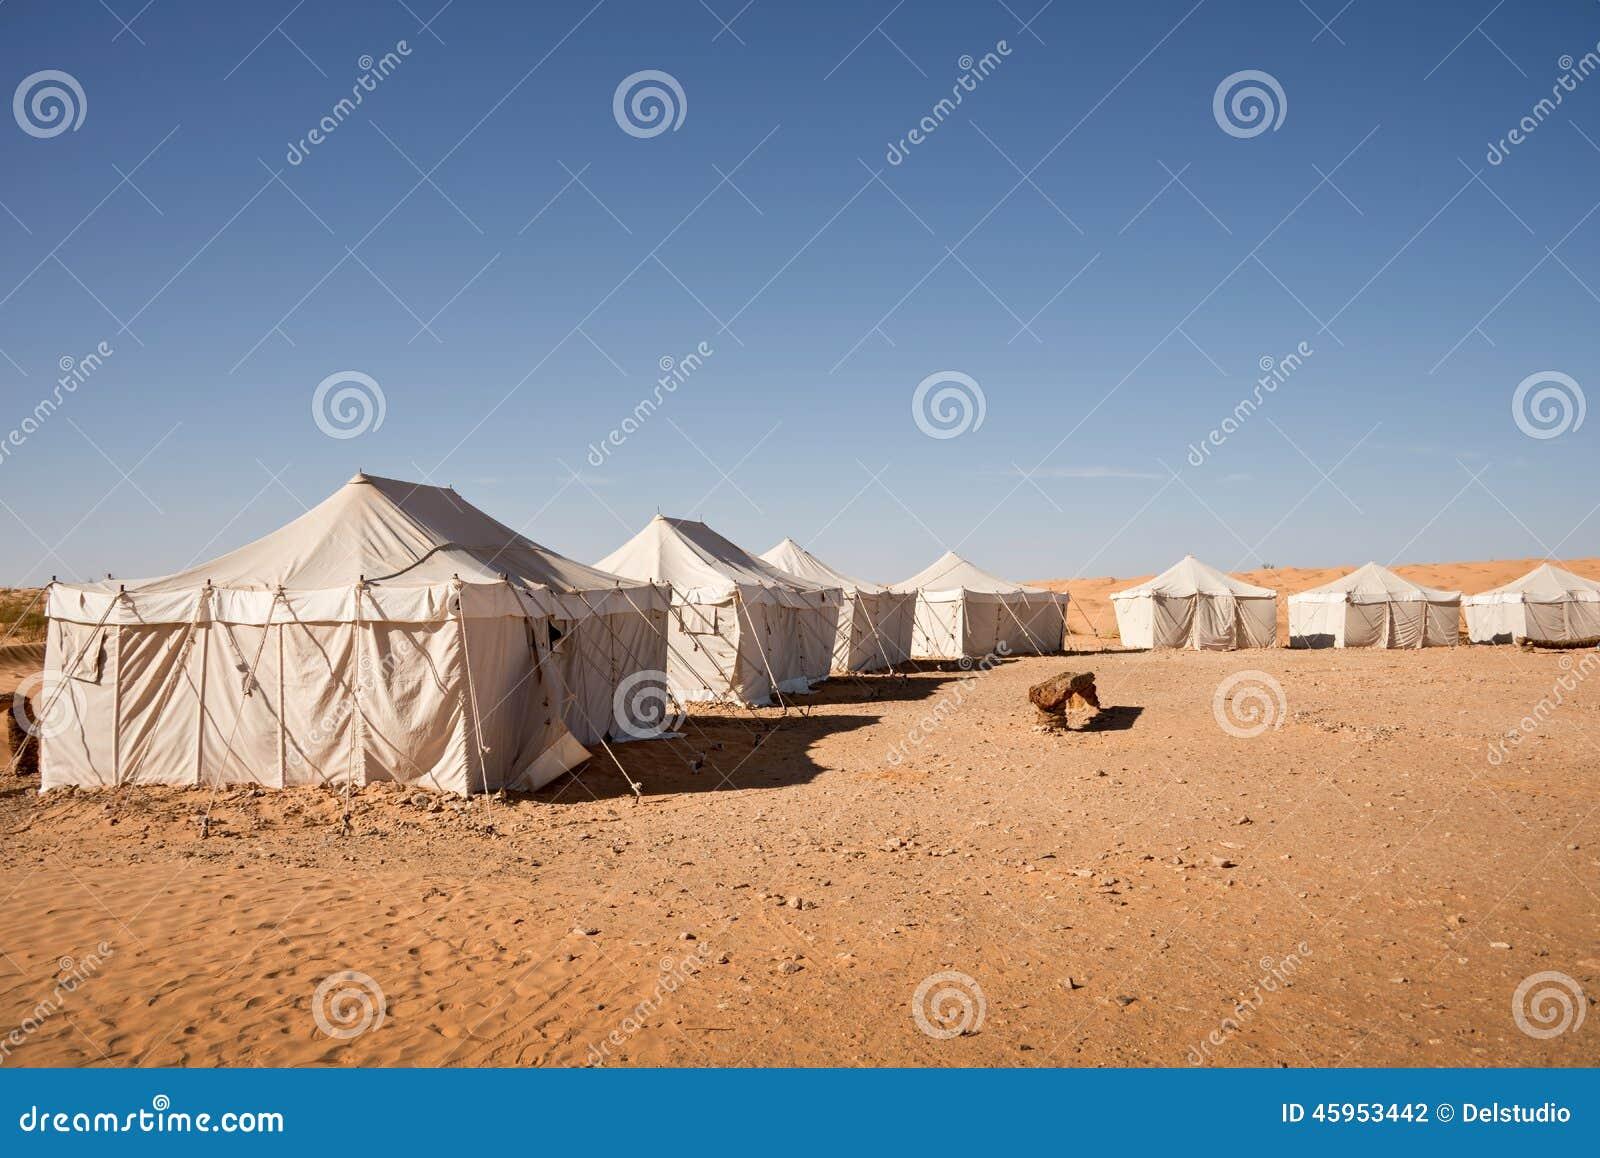 Acampamento das barracas no deserto de Sahara